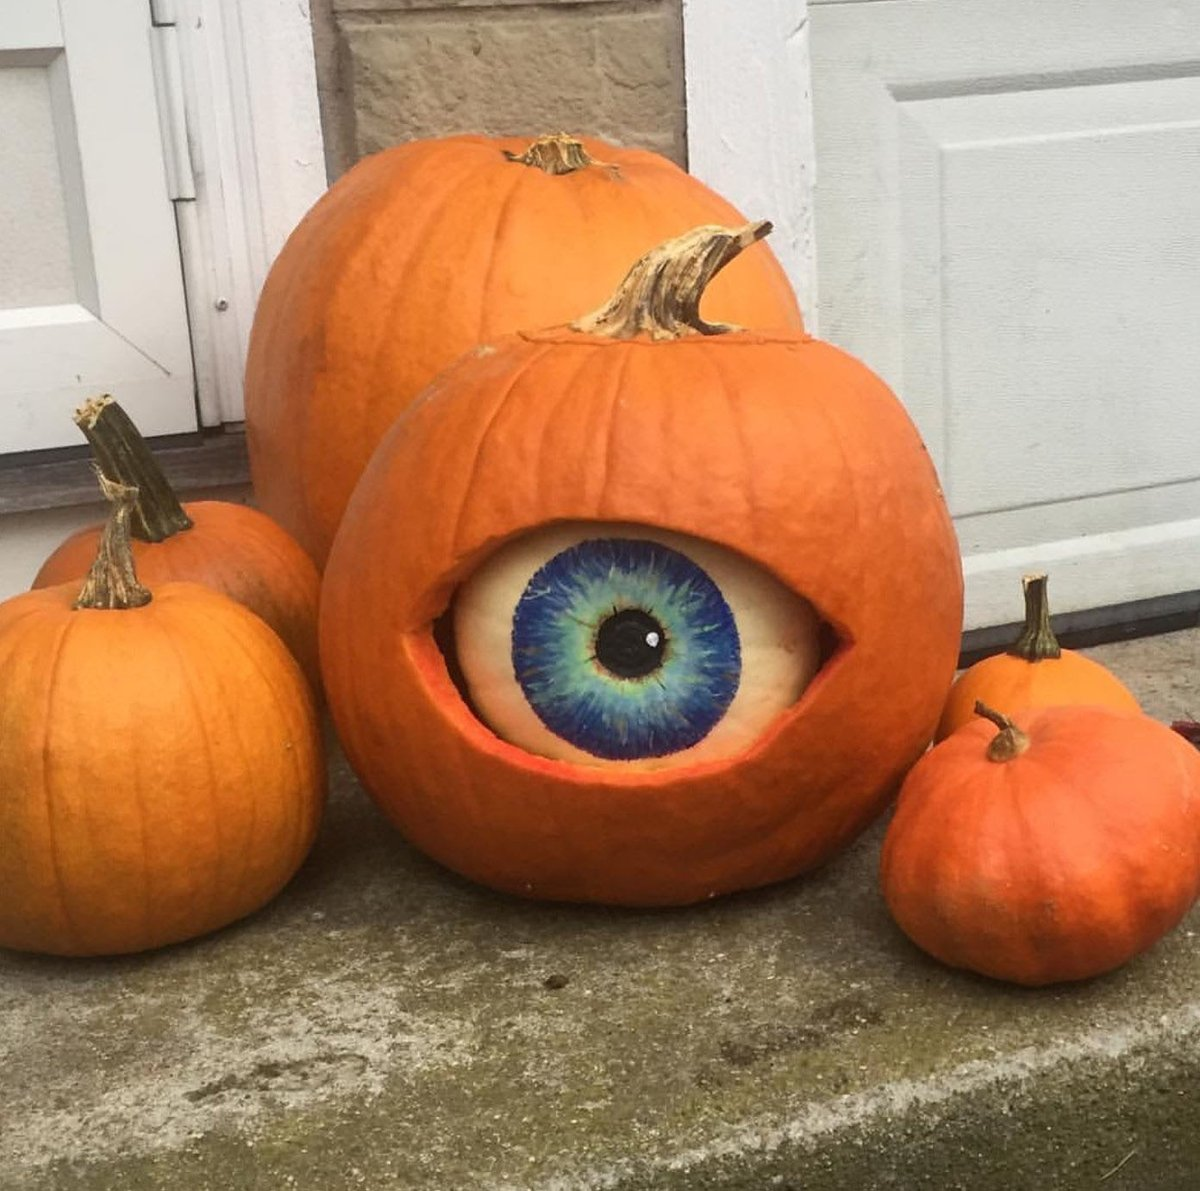 20 Most Unique Pumpkin Carving Ideas For Halloween Decorating https://t.co/AScFnsMC1O https://t.co/GDTOwrXuDb